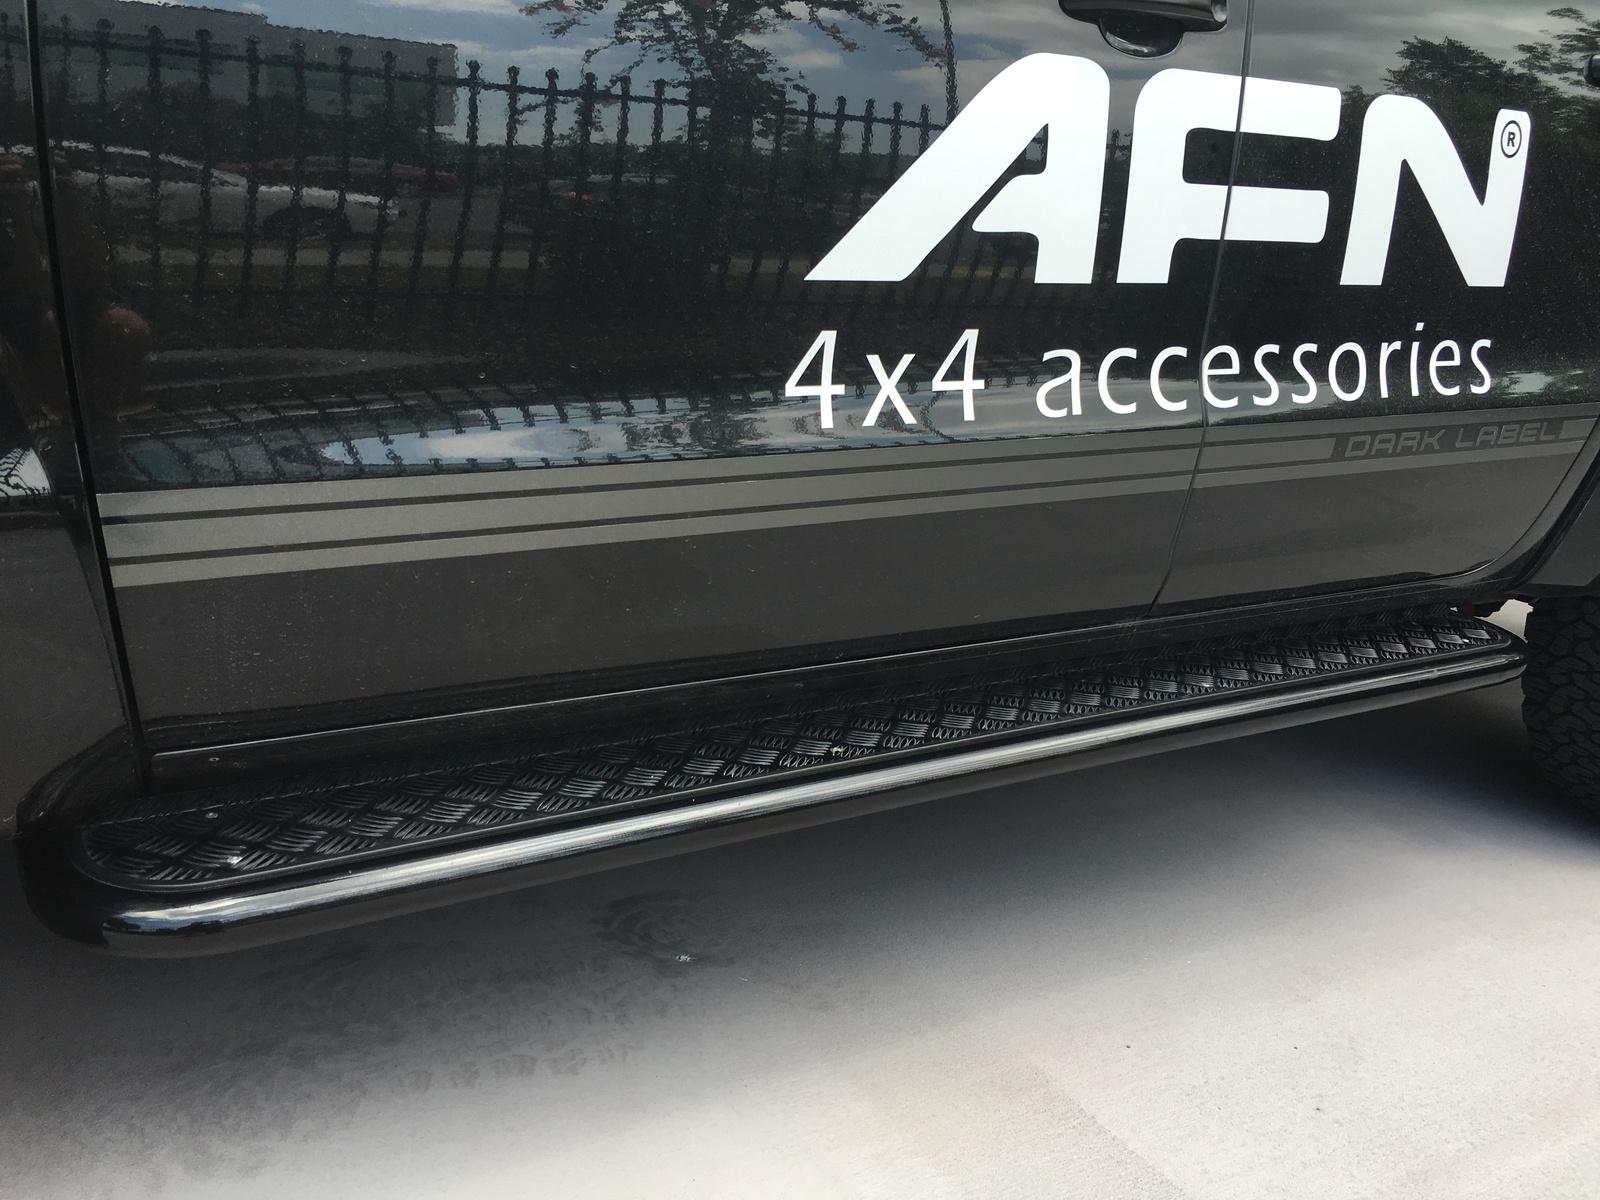 VW-AMAROK (42)